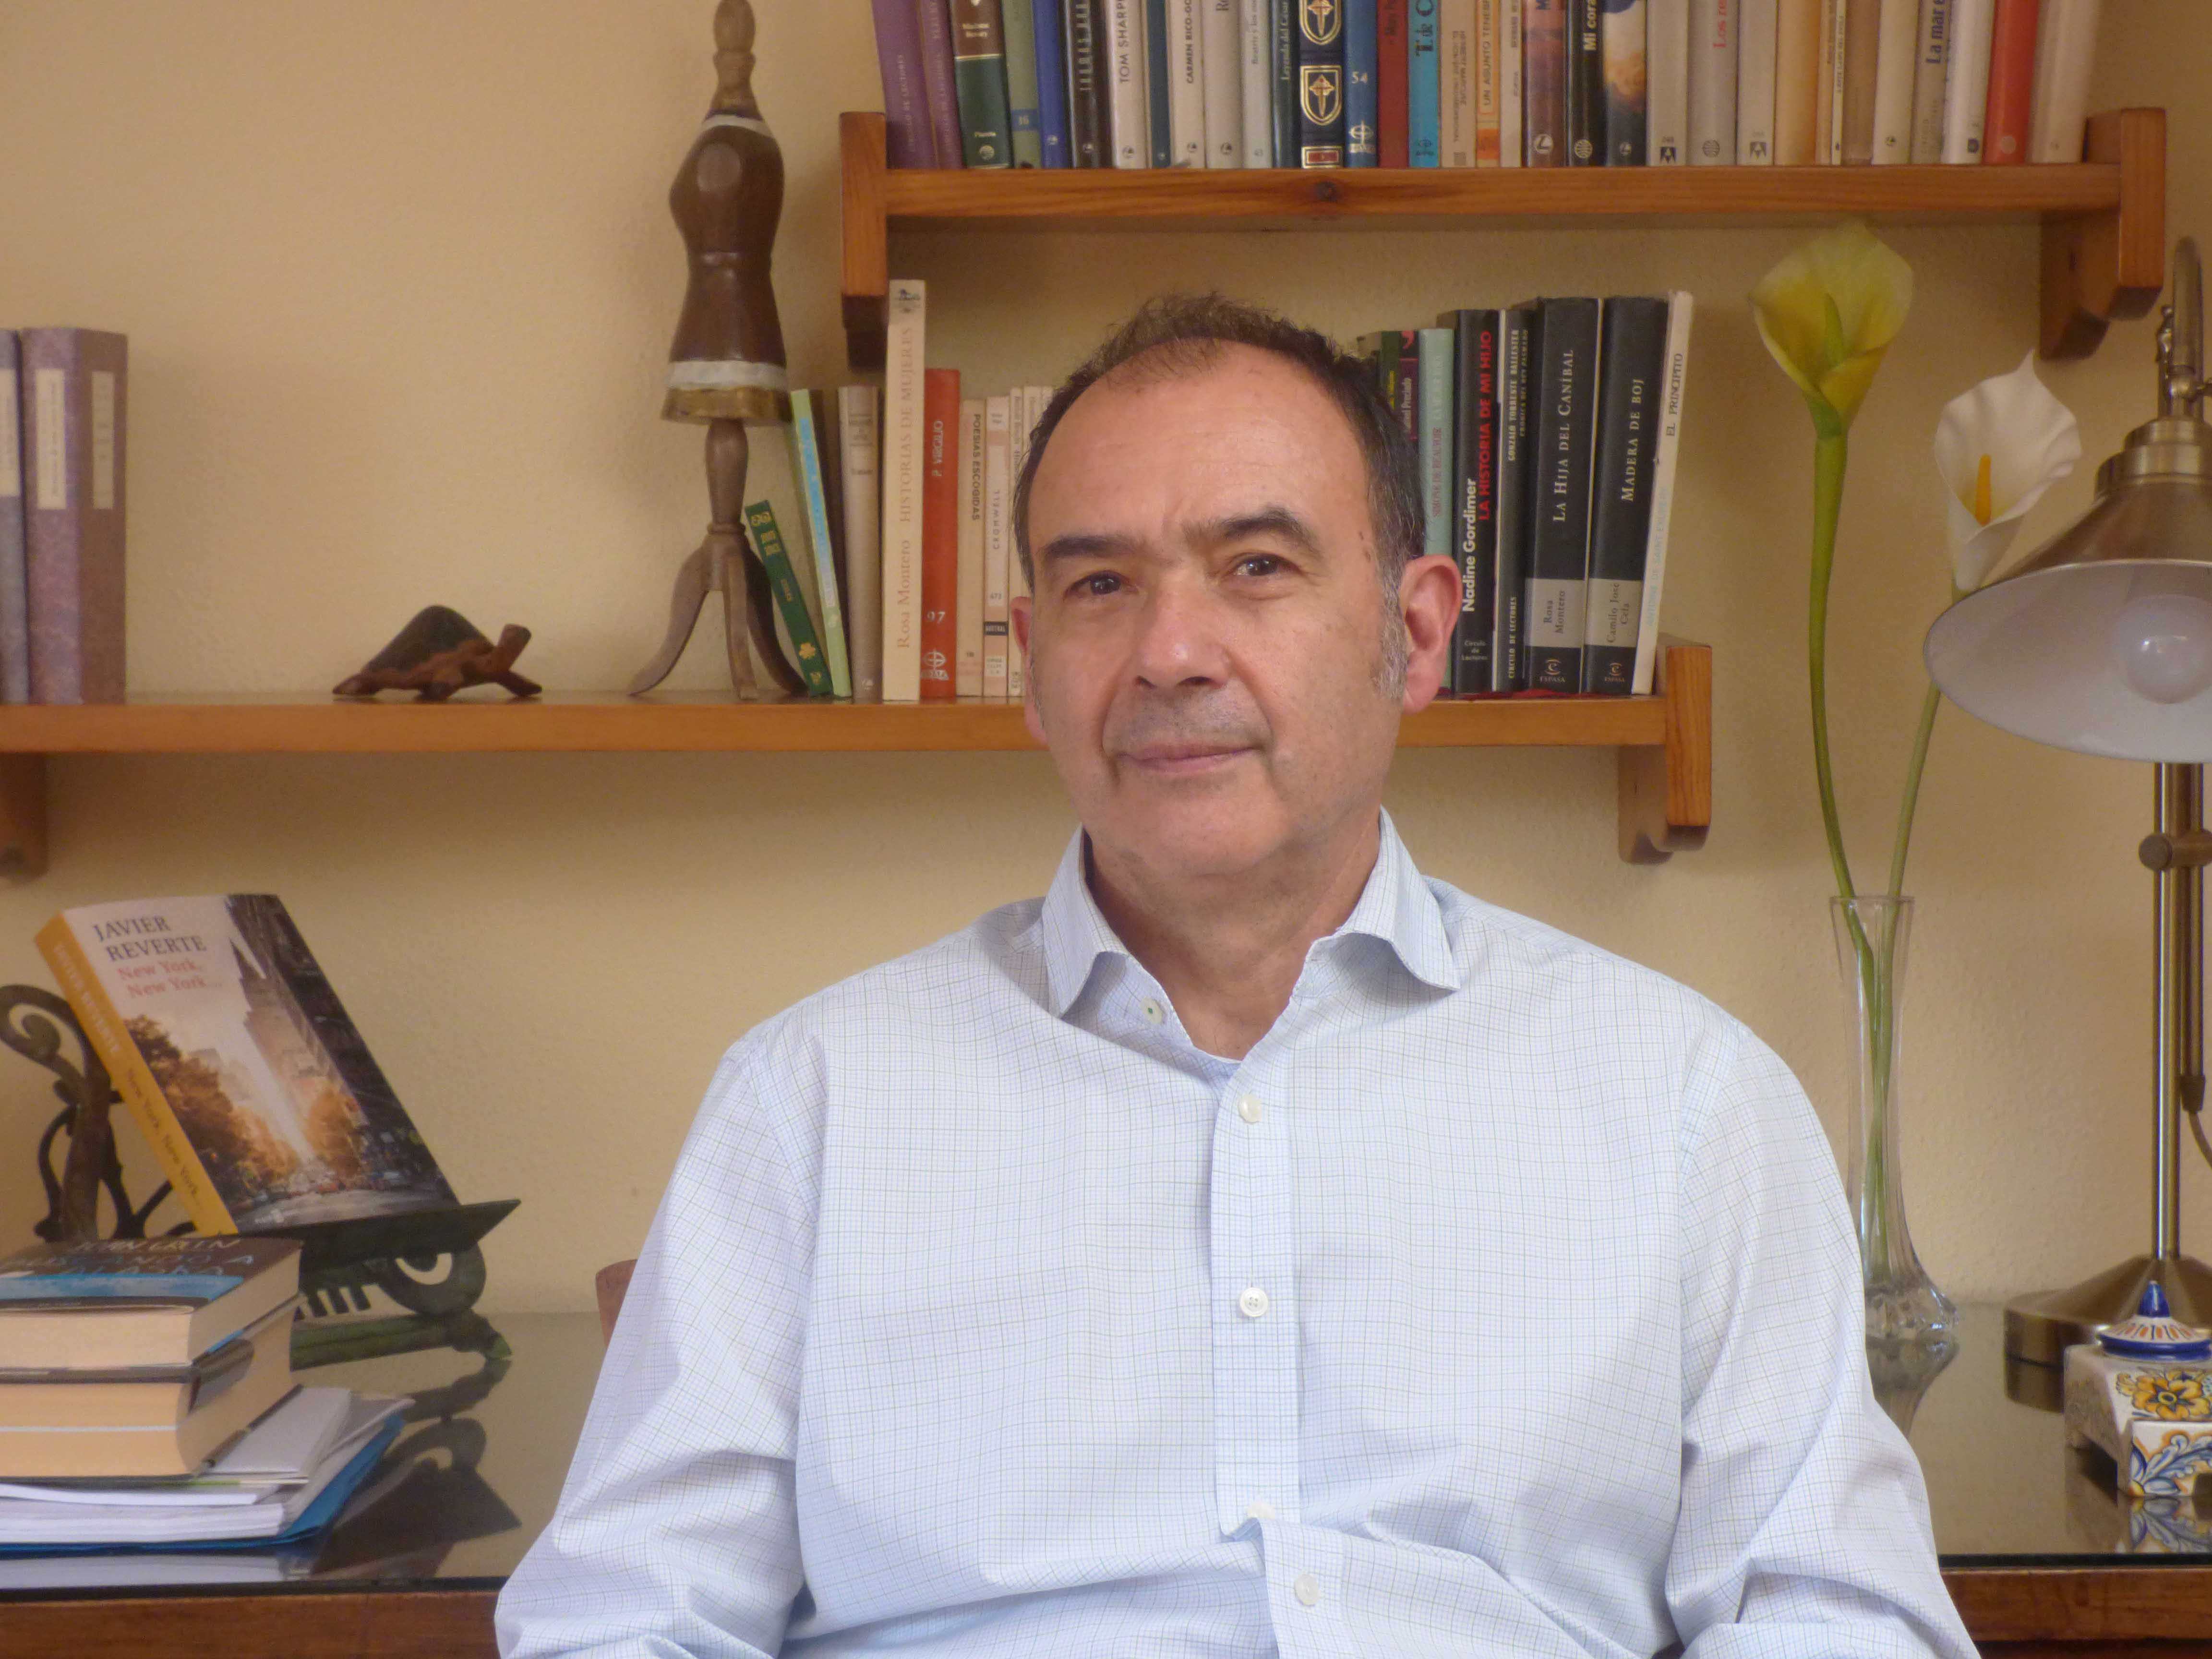 Francisco Javier González Valdepeñas